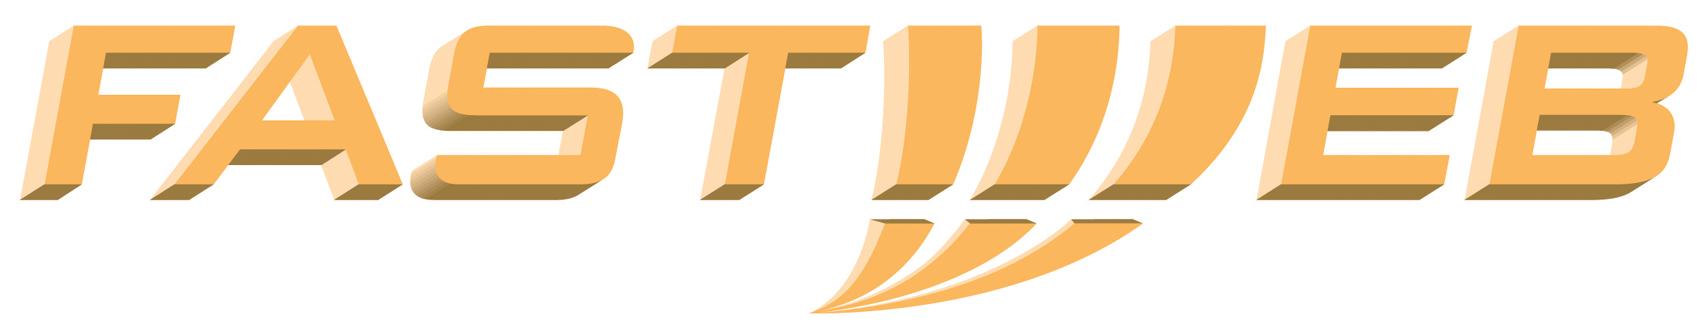 logo FASTWEB.eps.